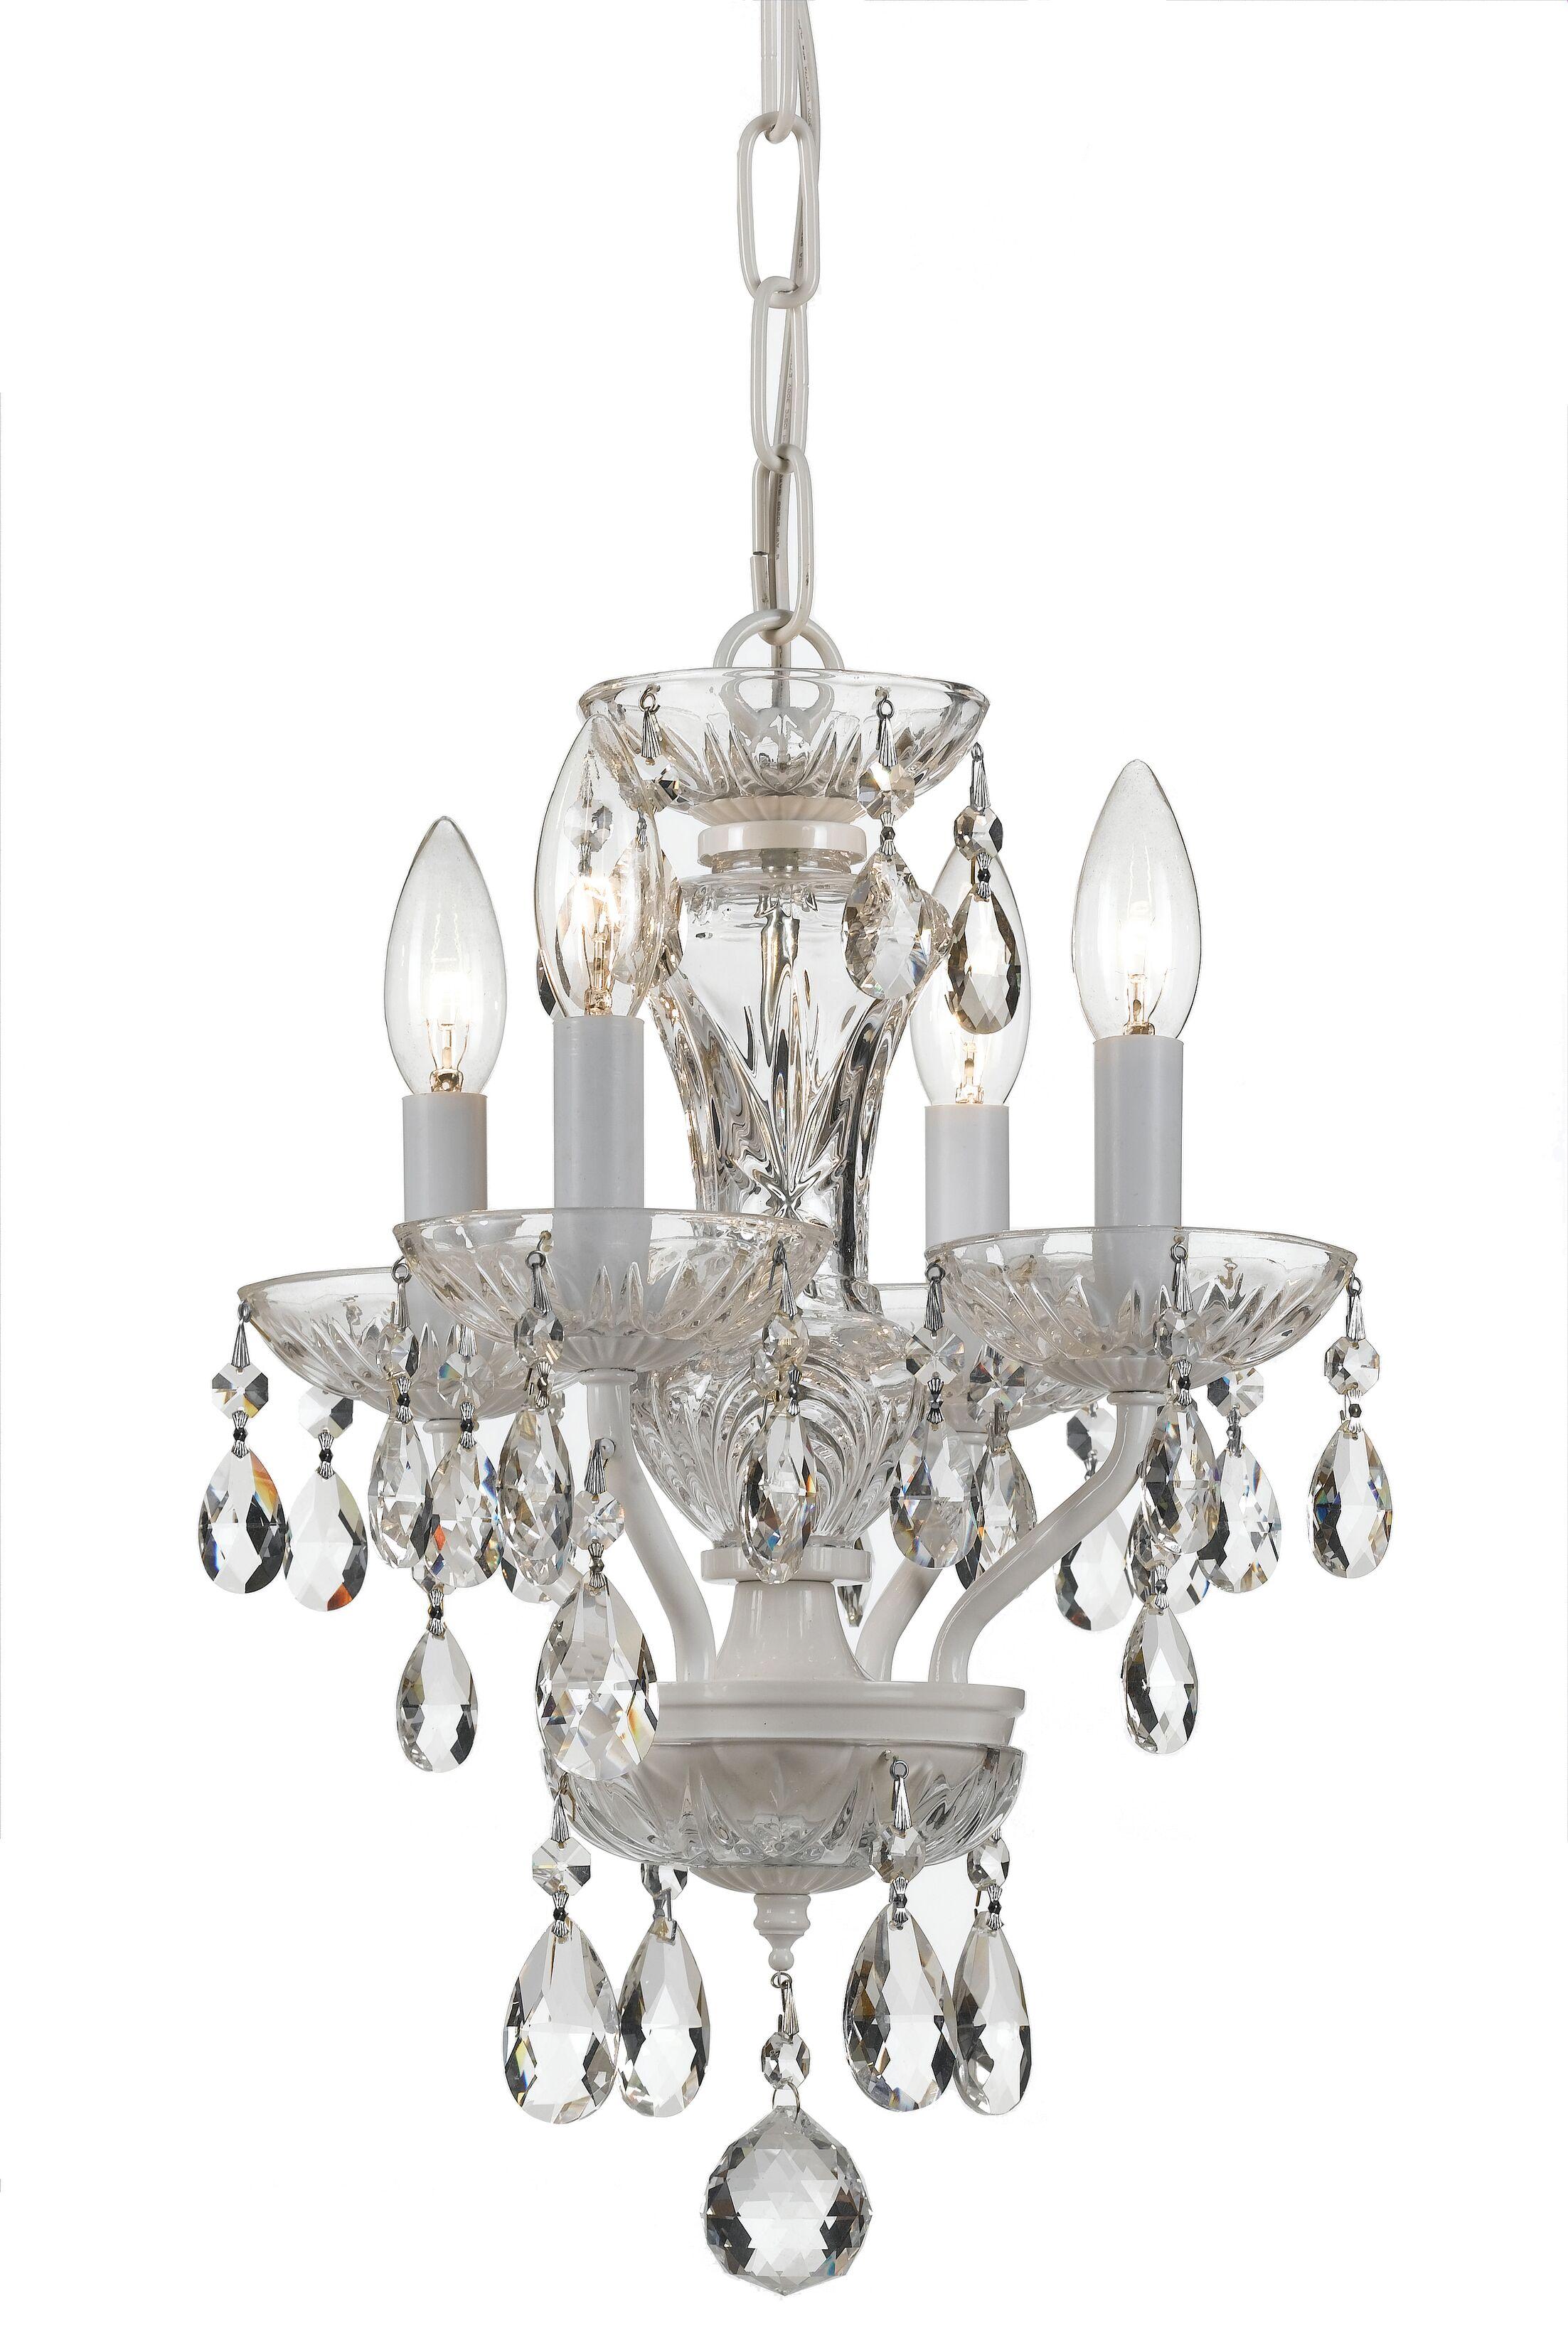 Weigel 4-Light Candle Style Chandelier Crystal Grade: Swarovski Spectra, Finish: White